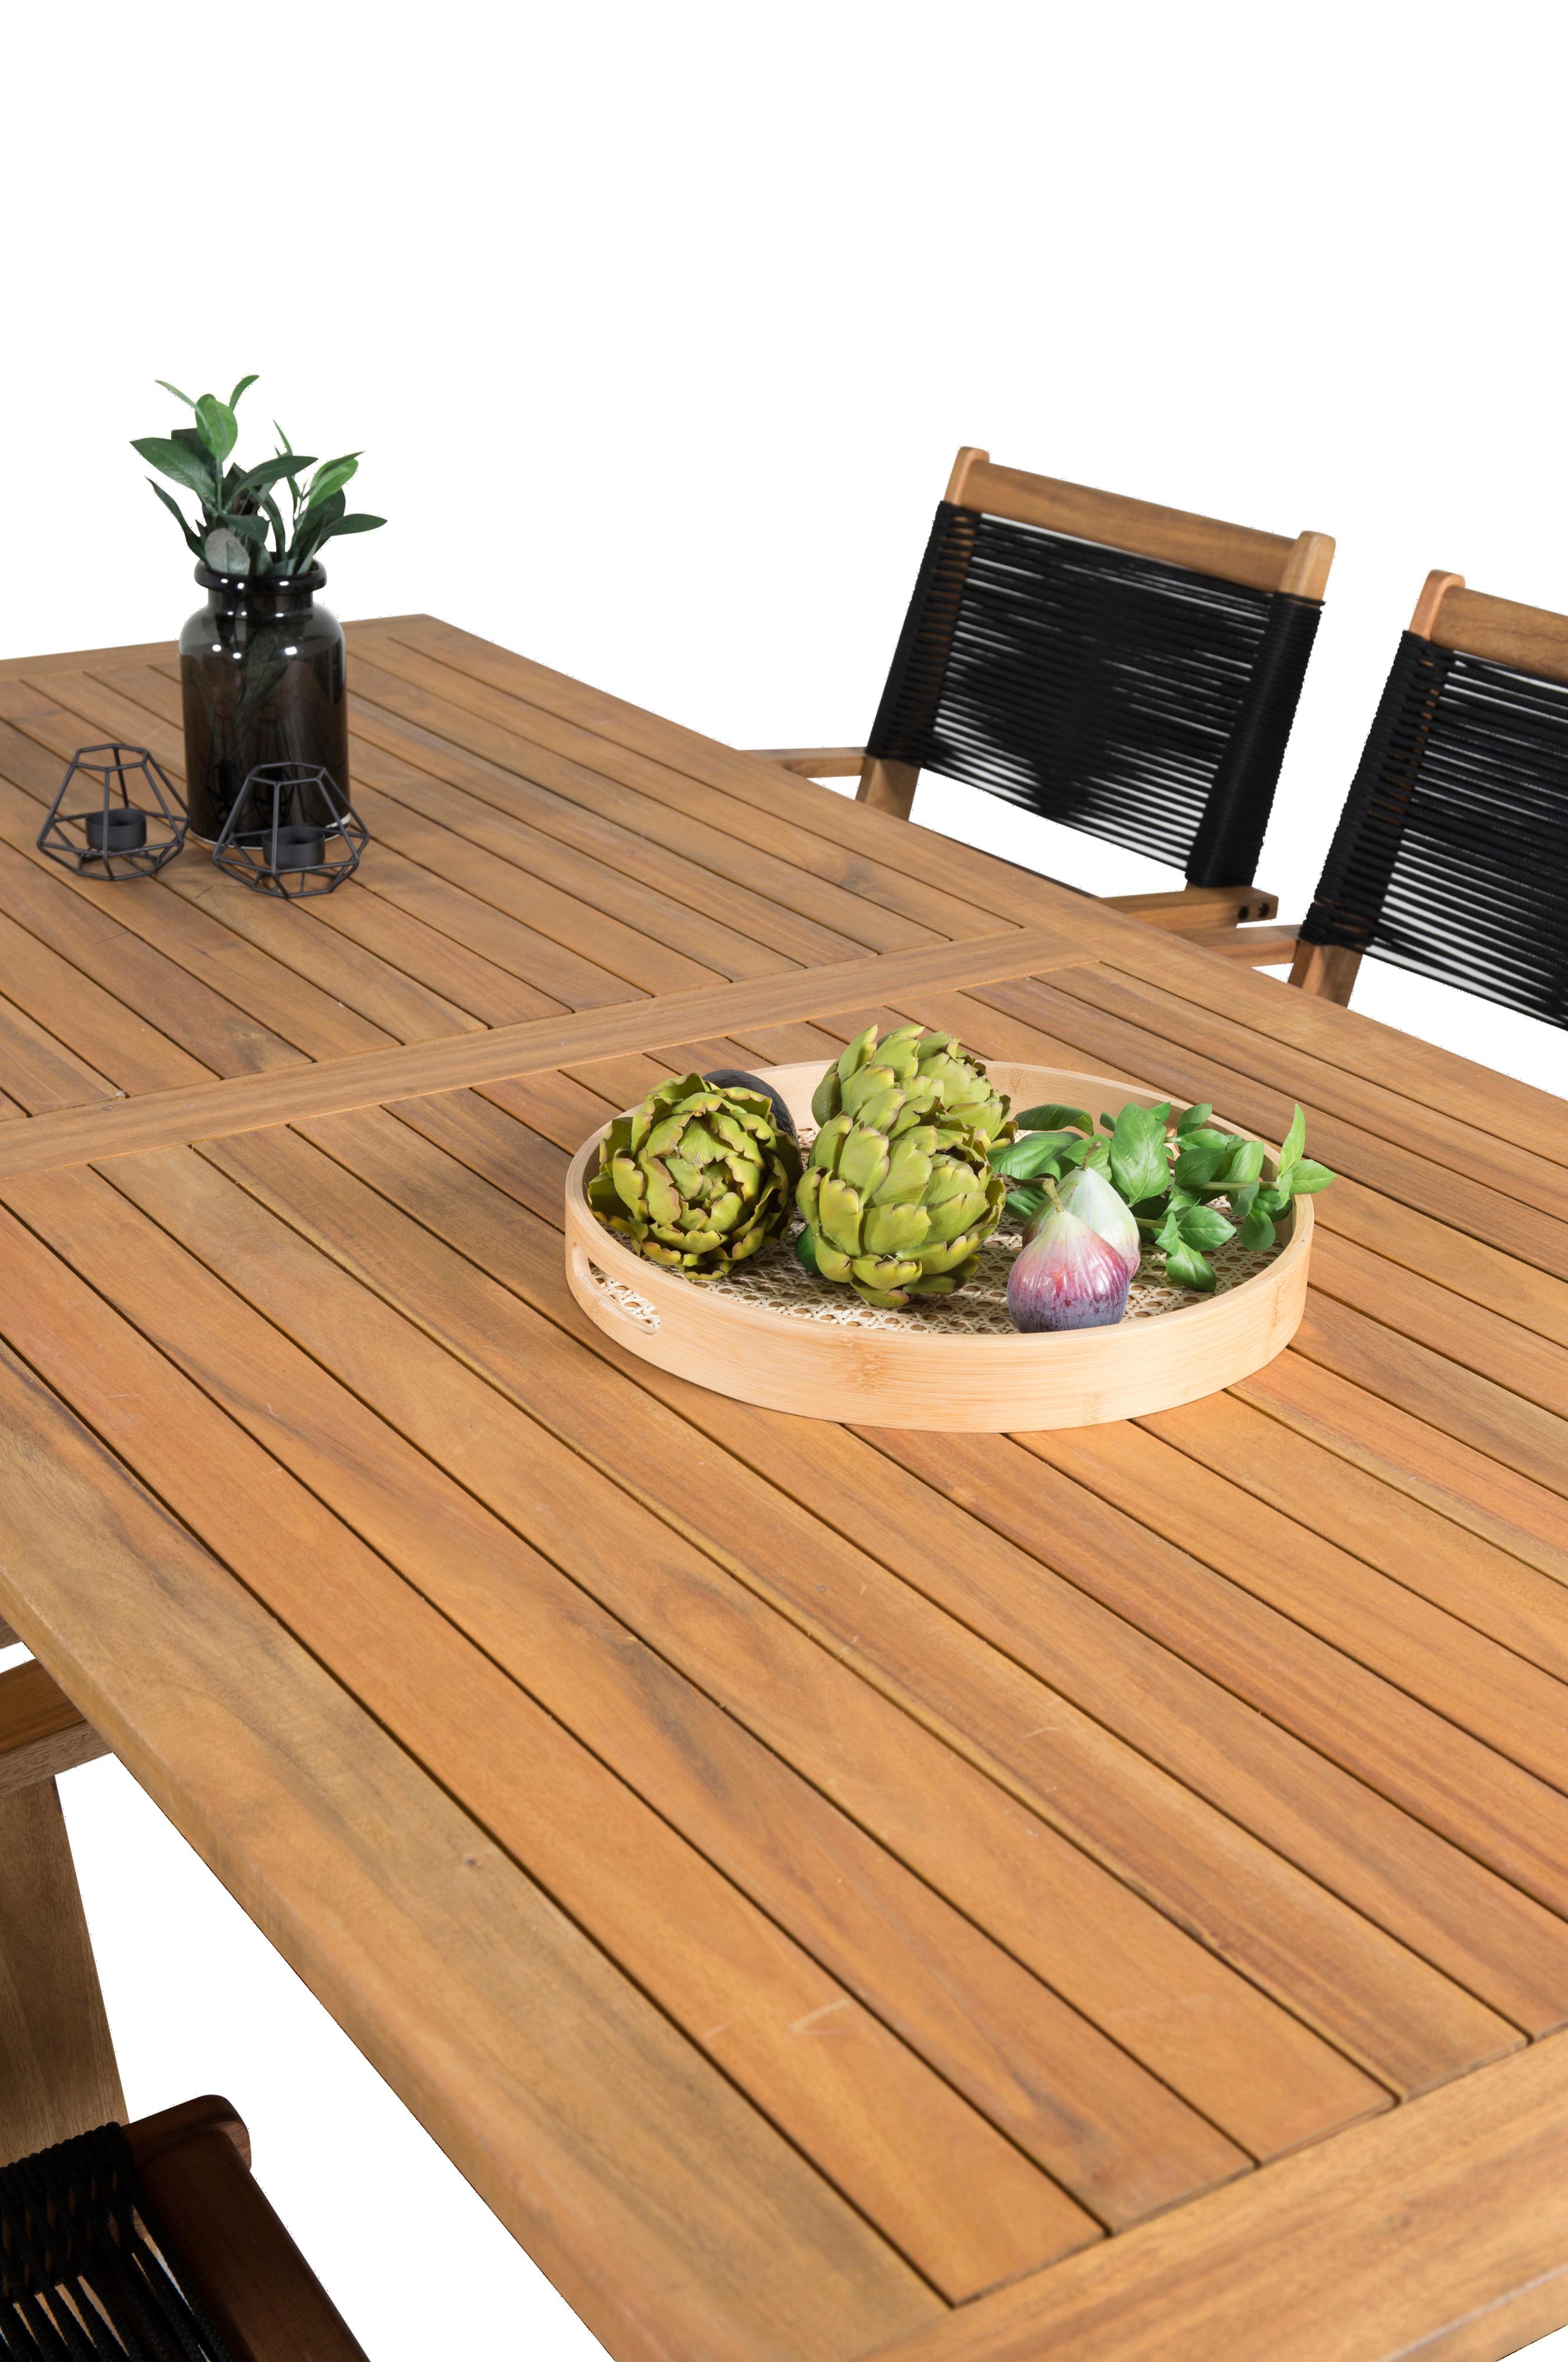 NORDFORM Spisebord Celine og 6 Pluto spisestoler Natur